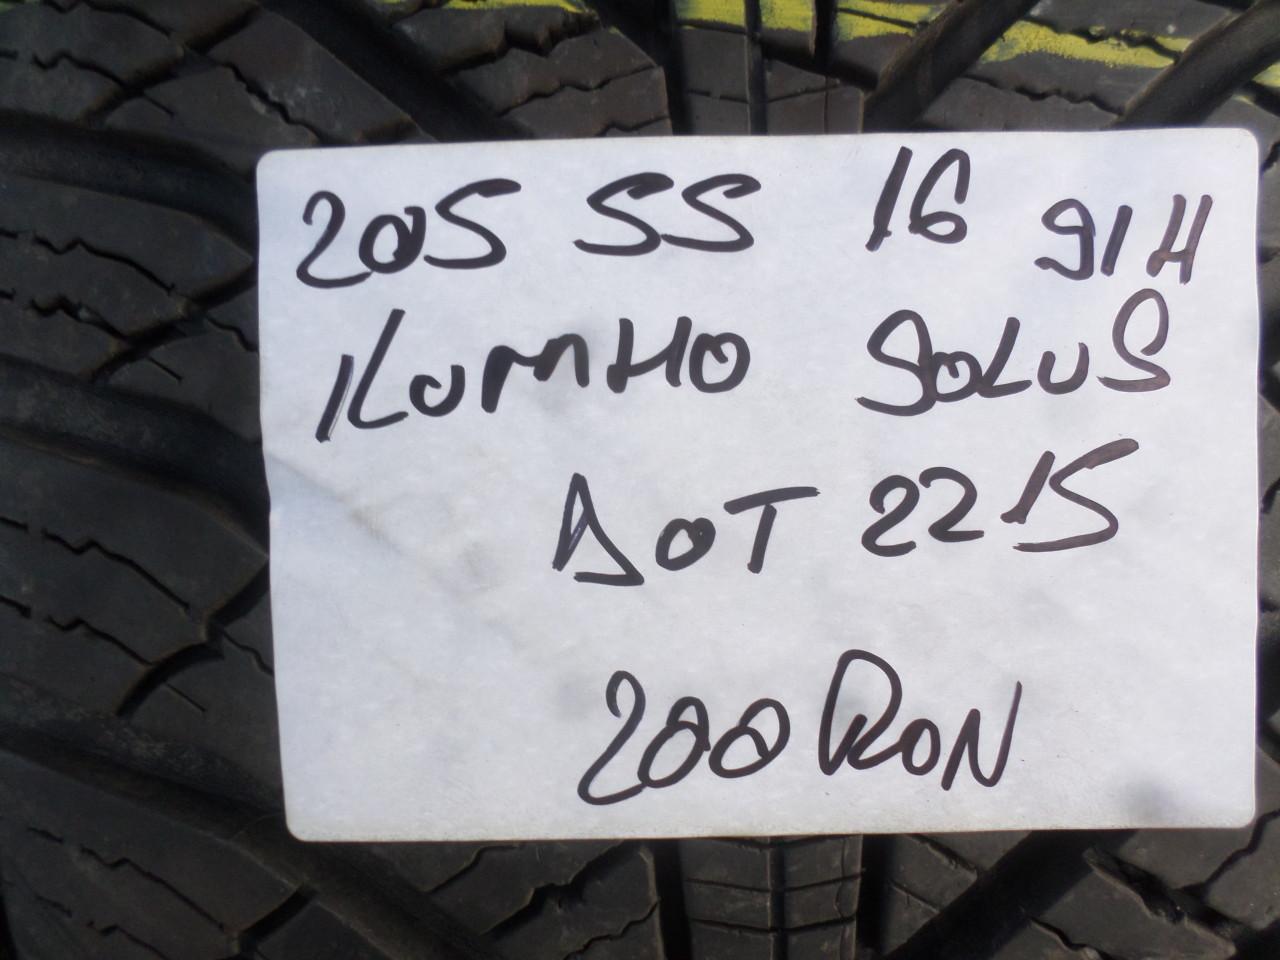 205 50 16 Iarna kumho Solus